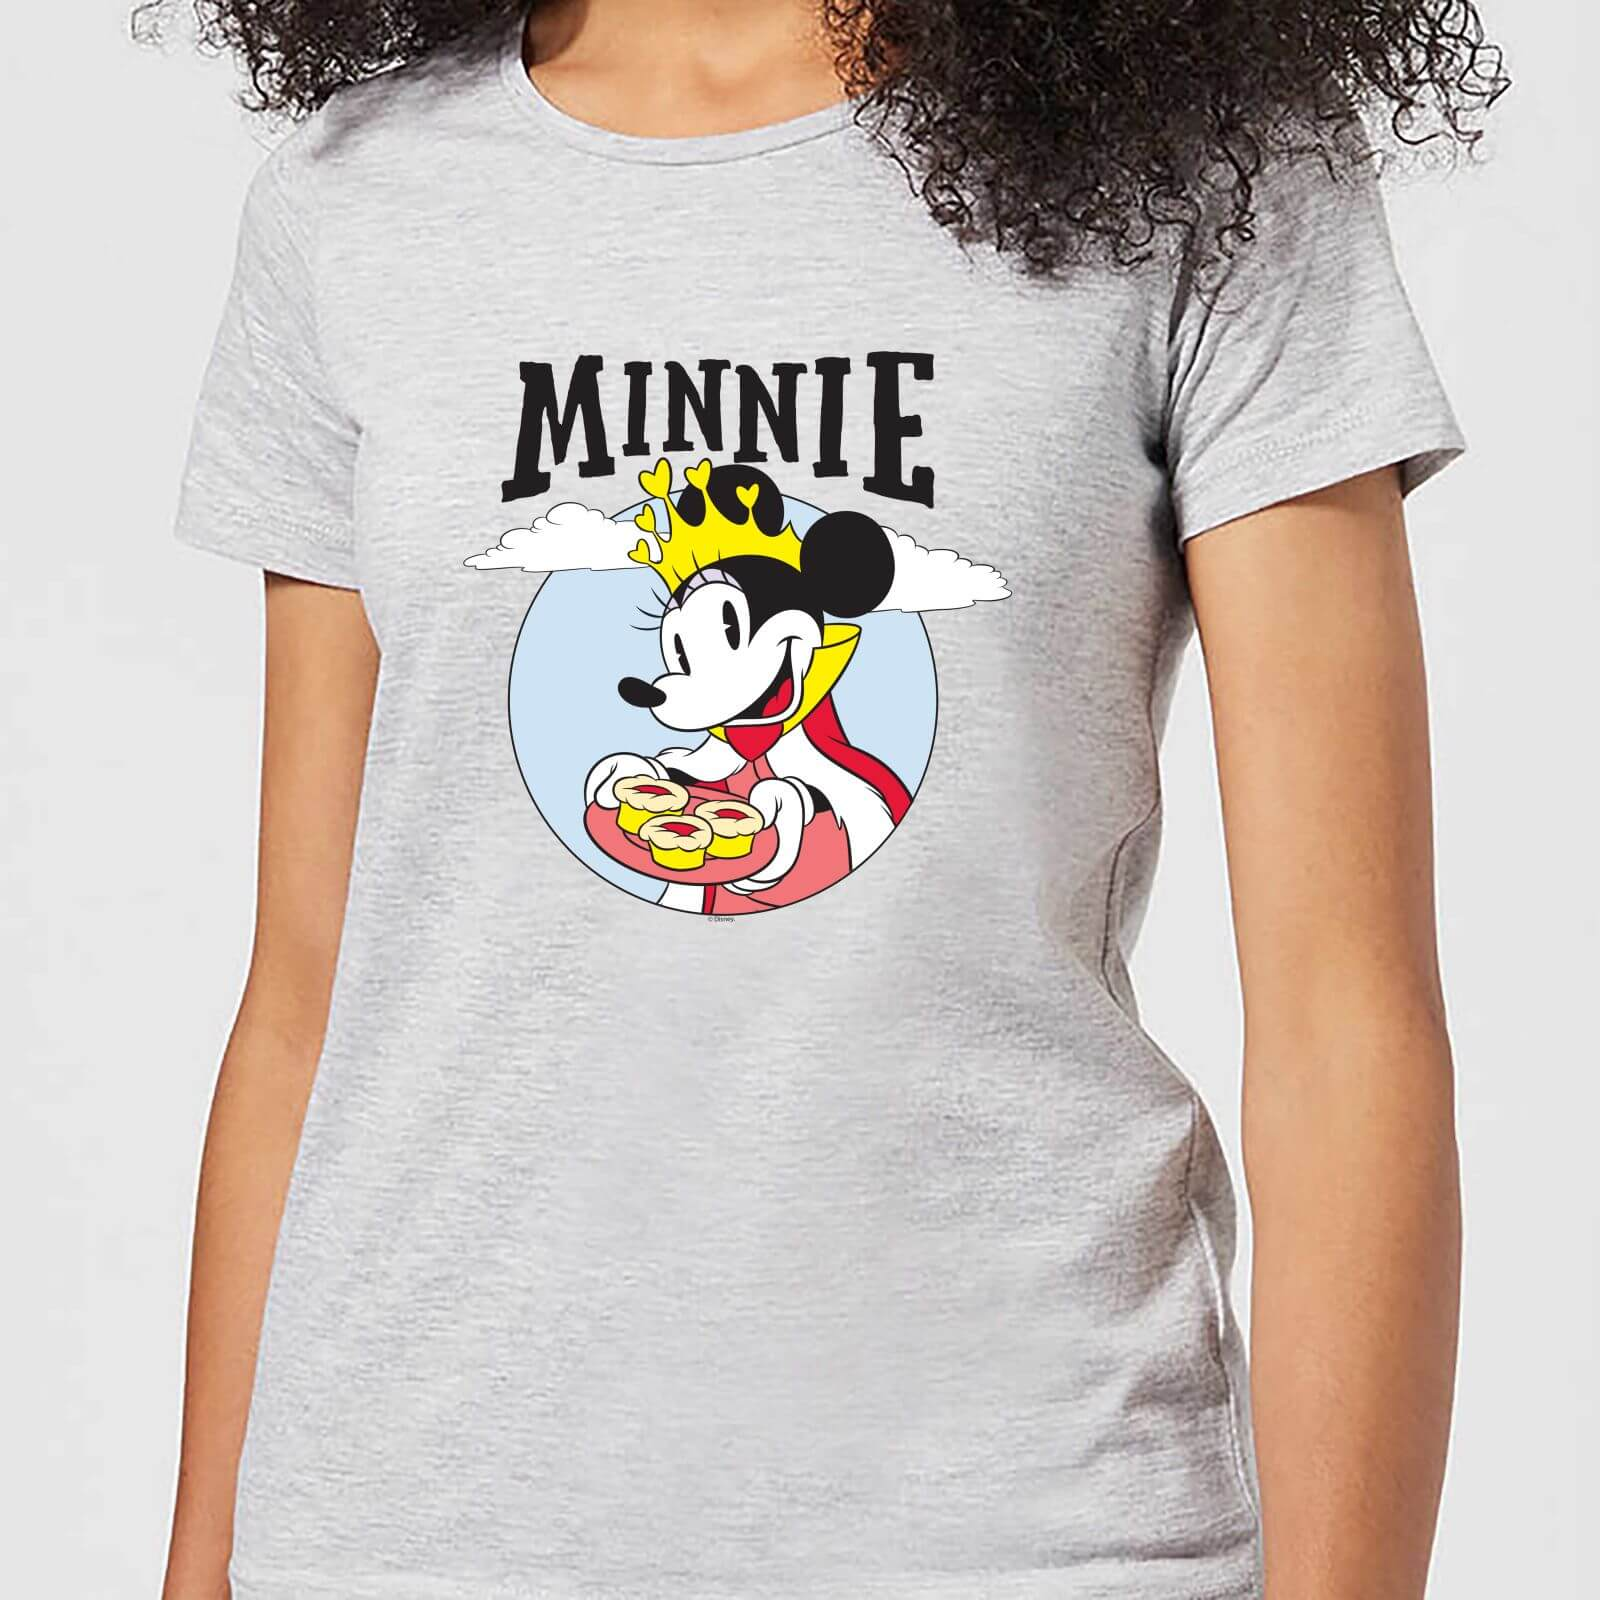 Disney Disney Mickey Mouse Queen Minnie Women's T-Shirt - Grey - 3XL - Grey